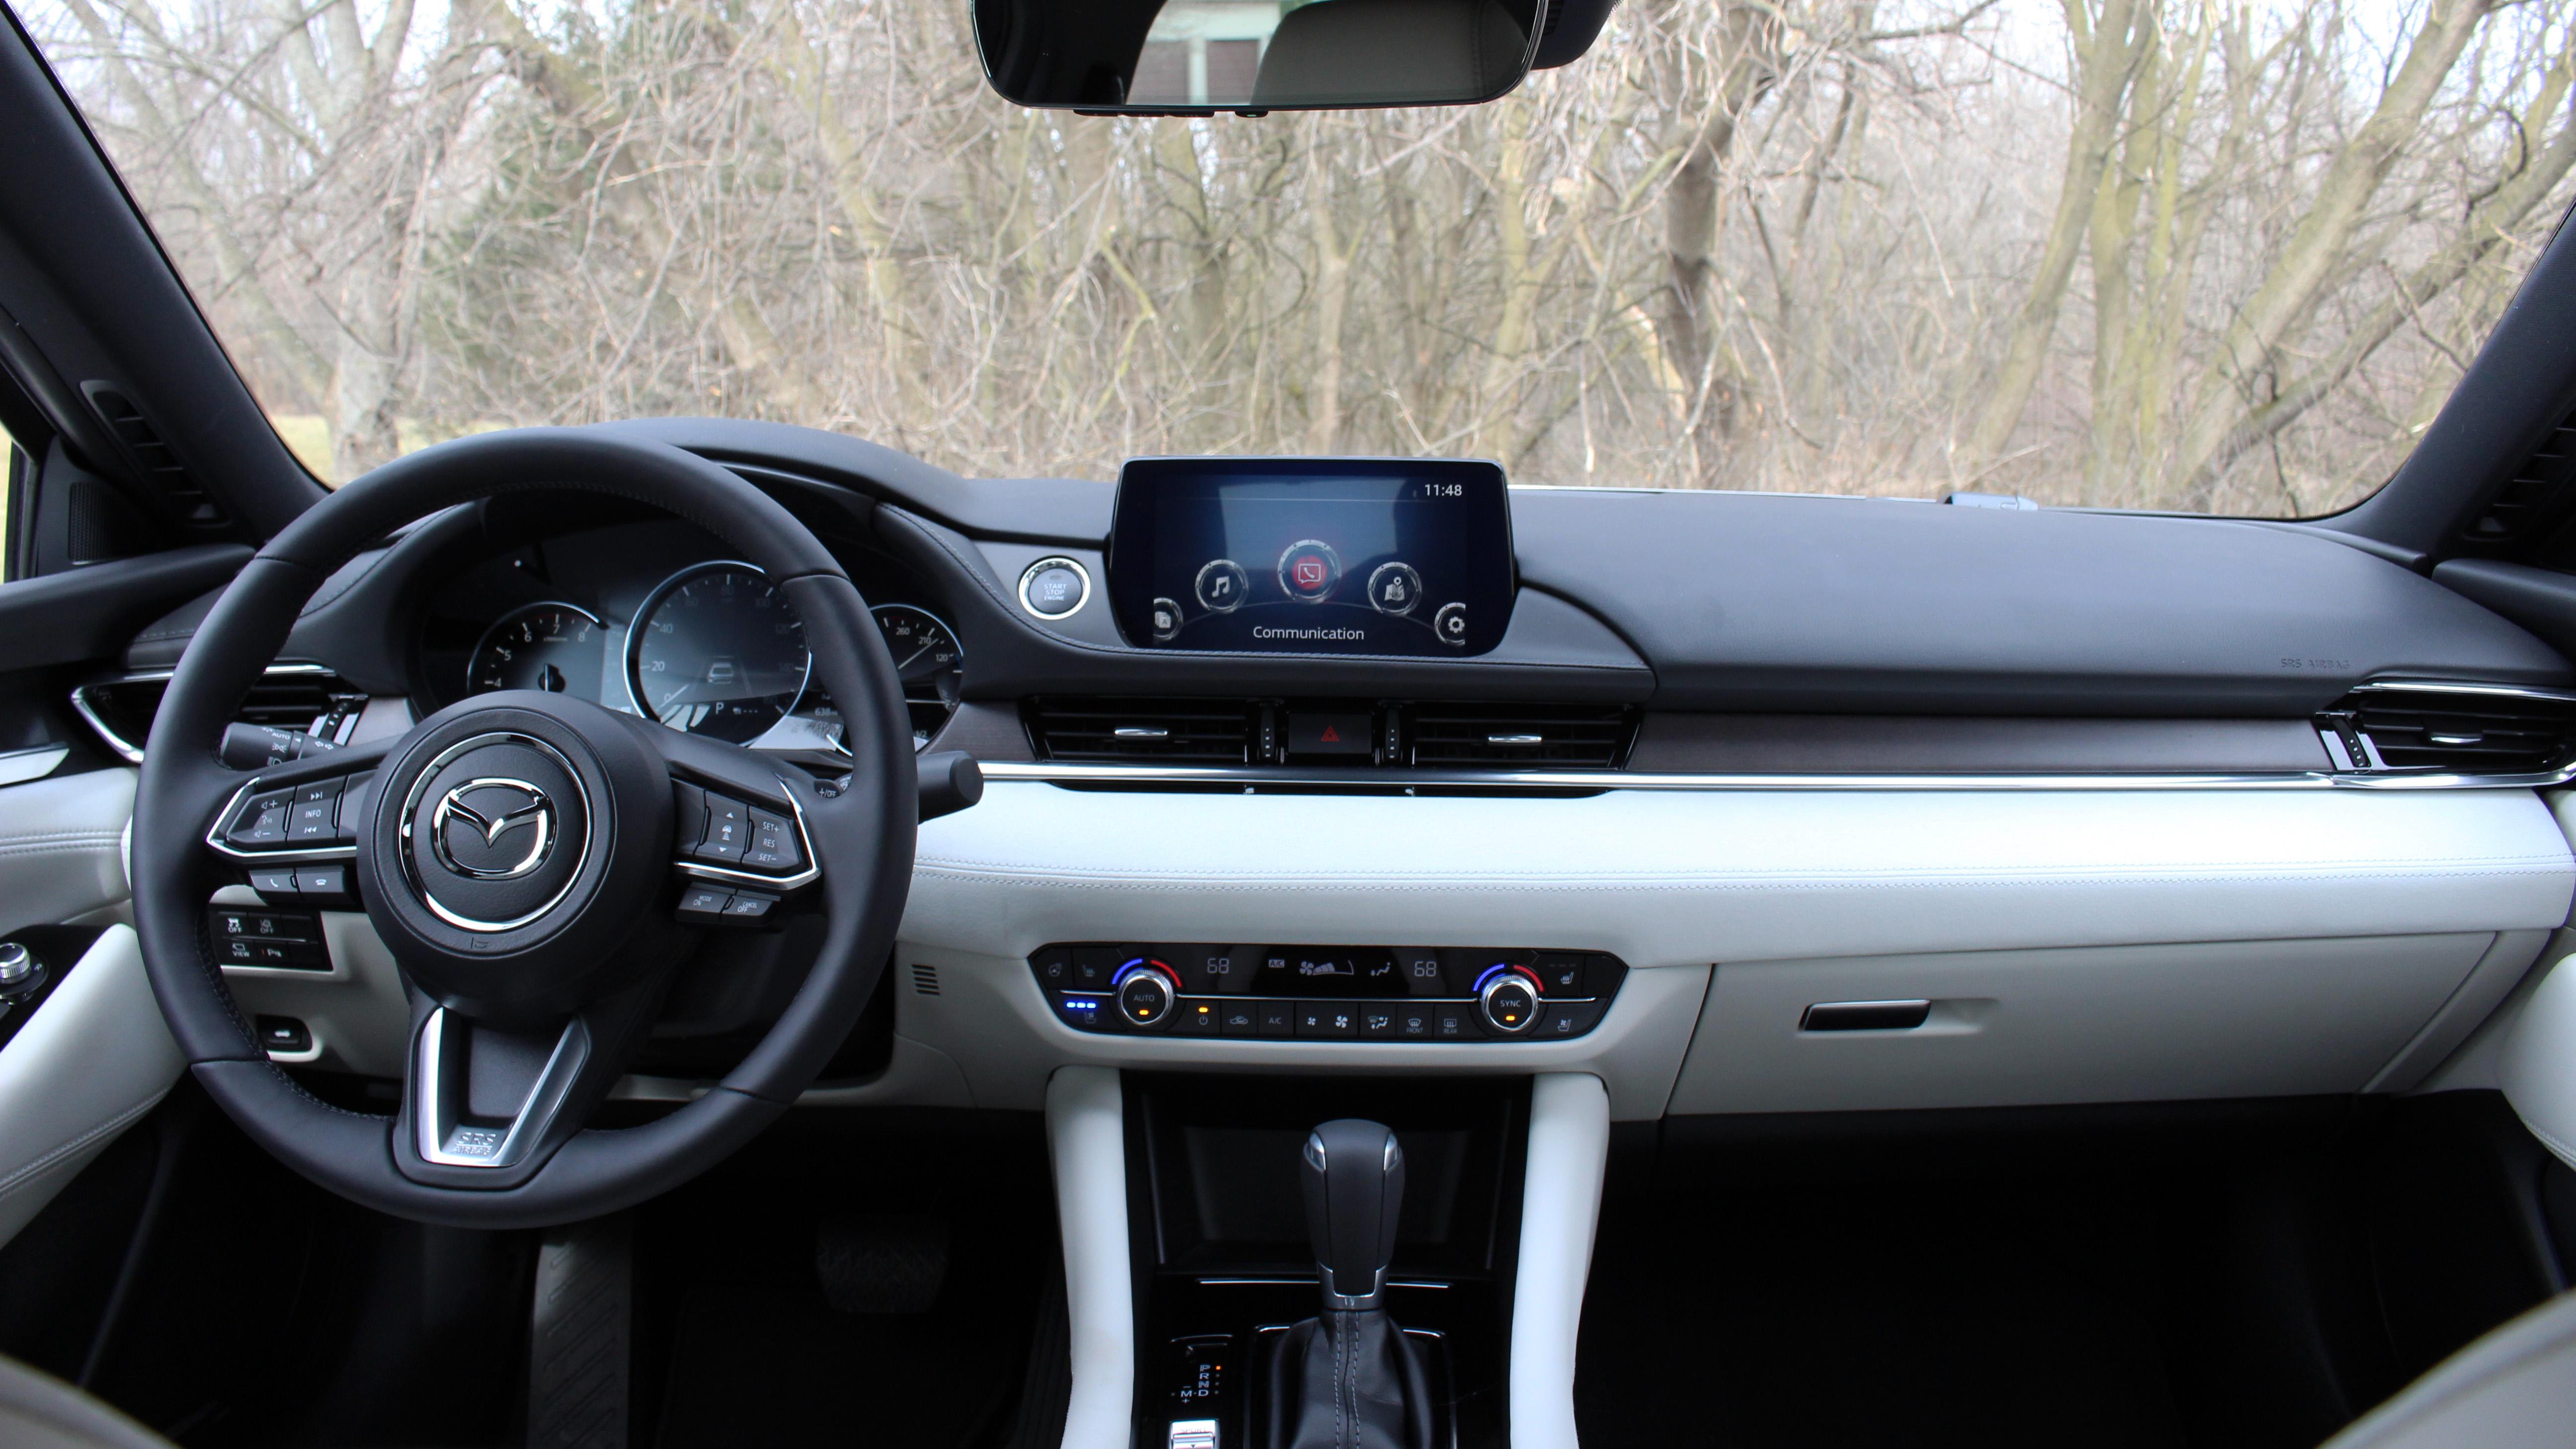 Kelebihan New Mazda 6 2020 Top Model Tahun Ini